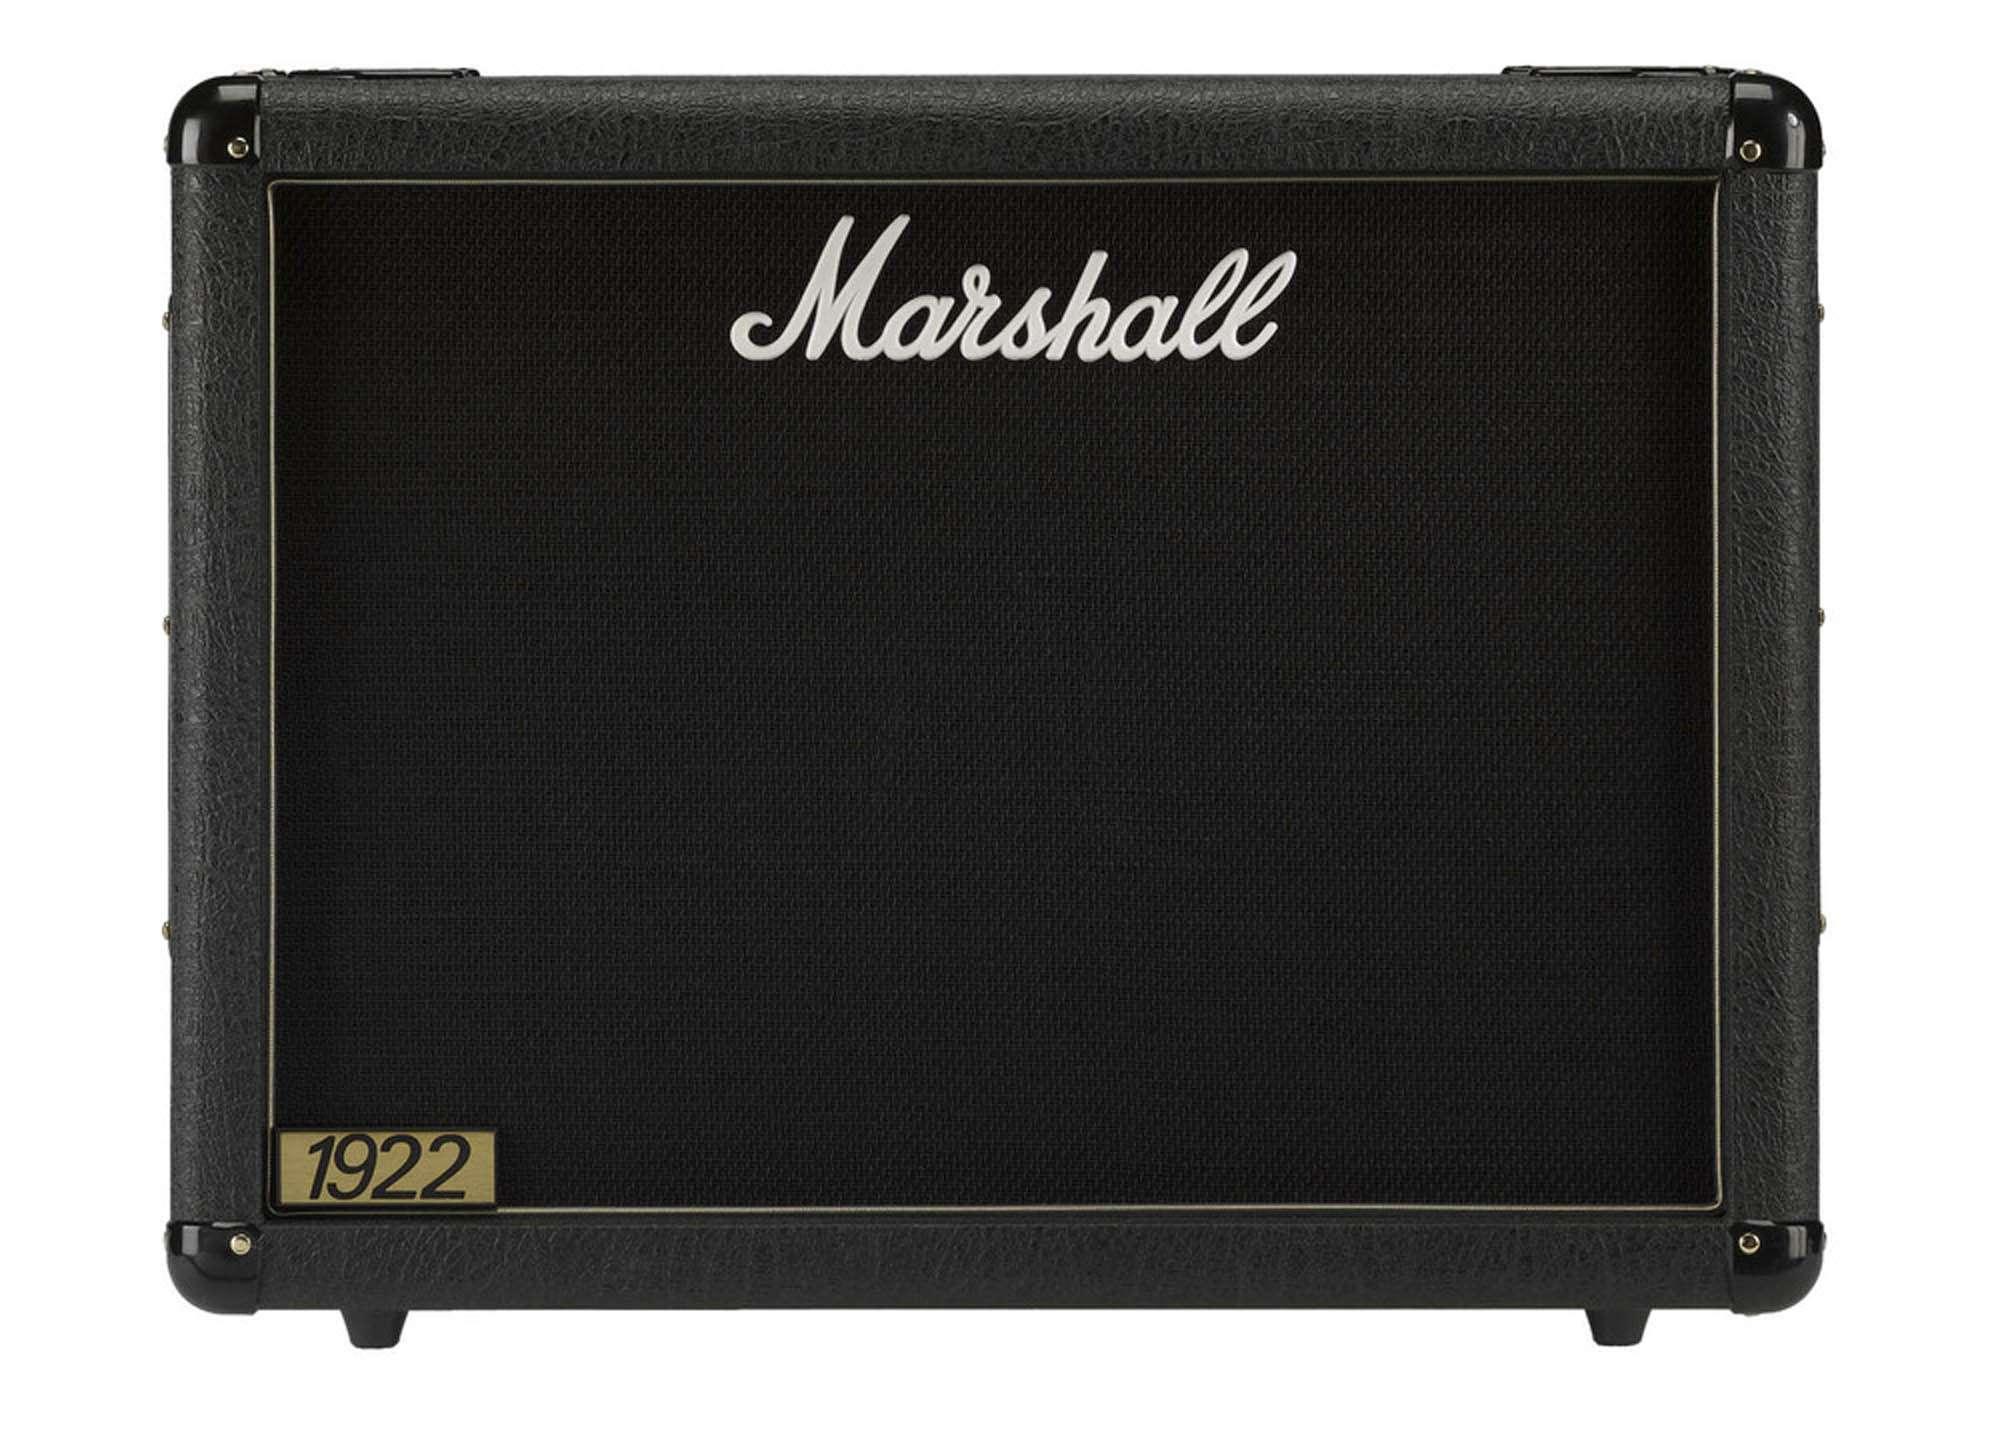 Marshall - 1922 - 212 - Cabinet